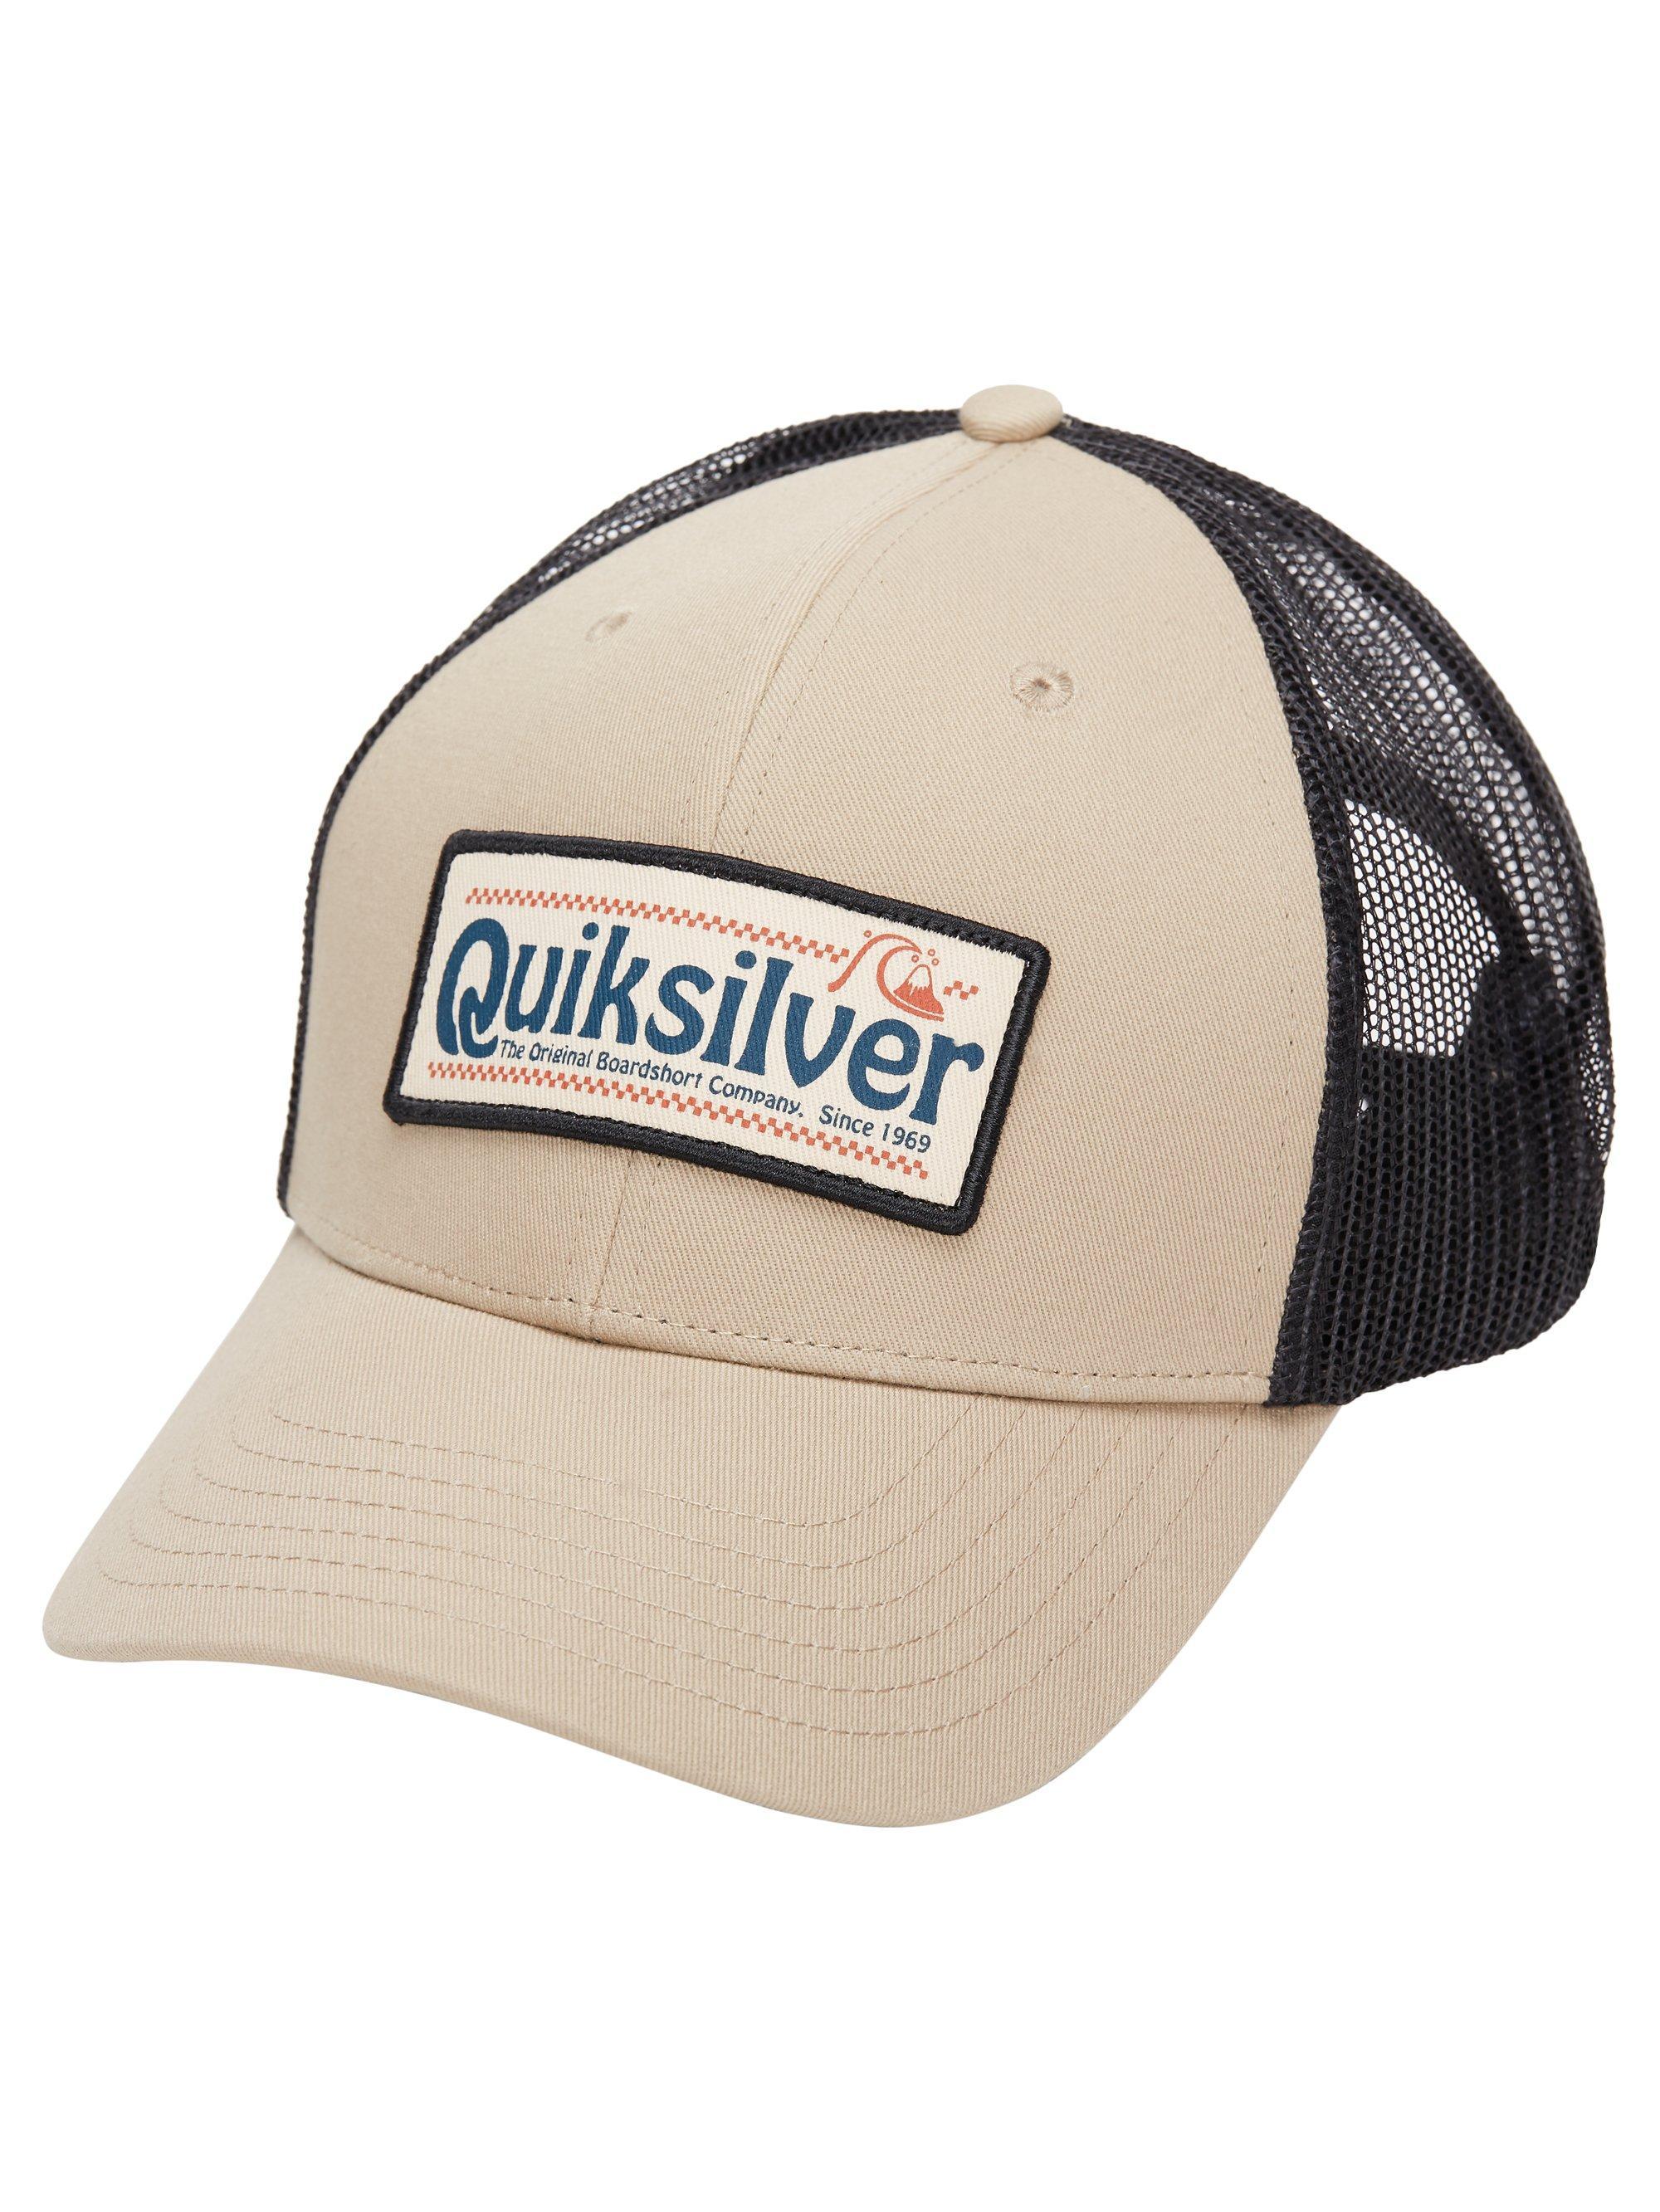 Men's Big Rigger Trucker Hat, Tan/Black, swatch